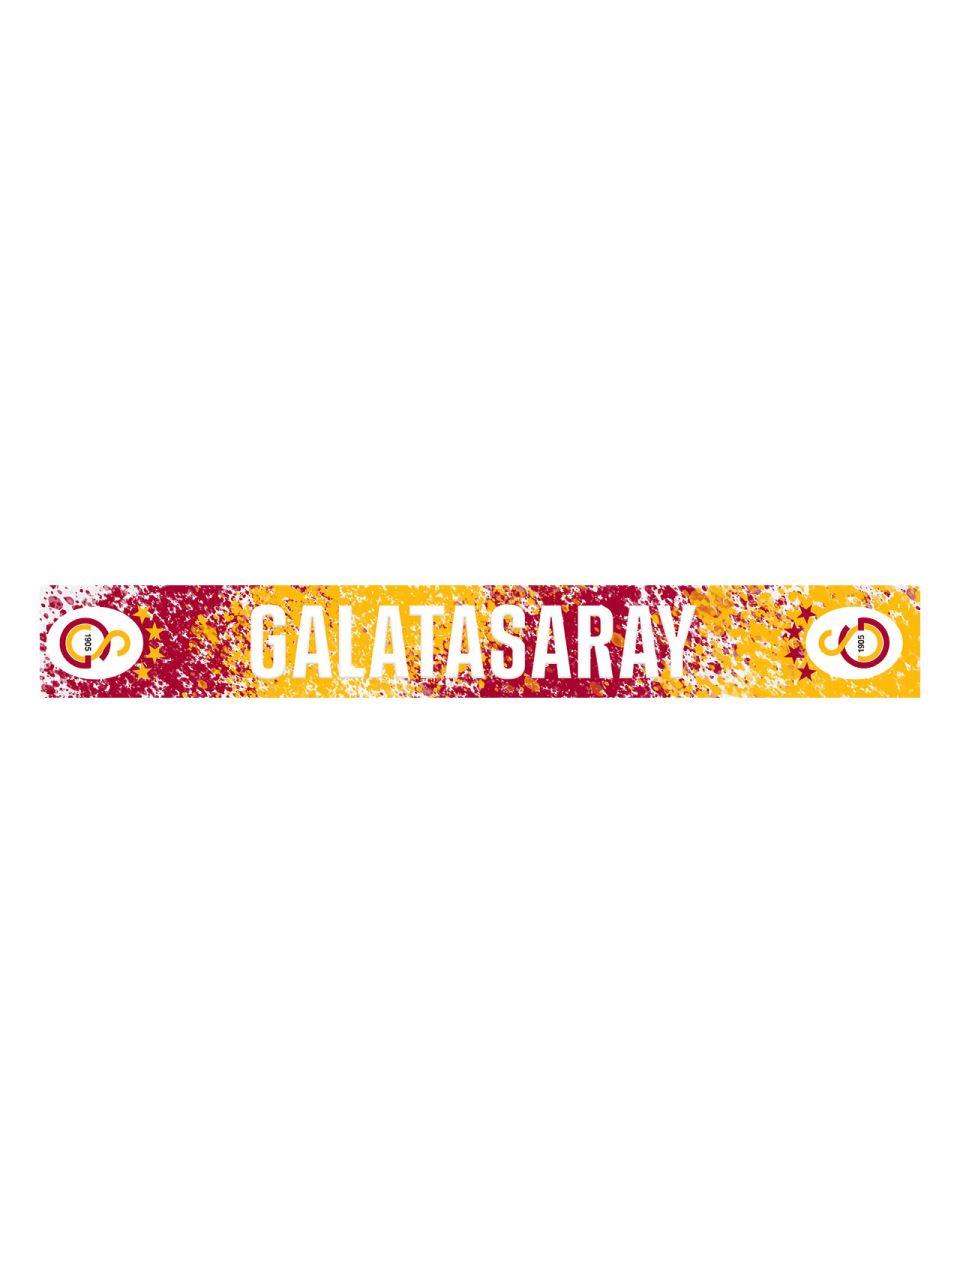 Galatasaray Kişiye Özel Atkı U212257